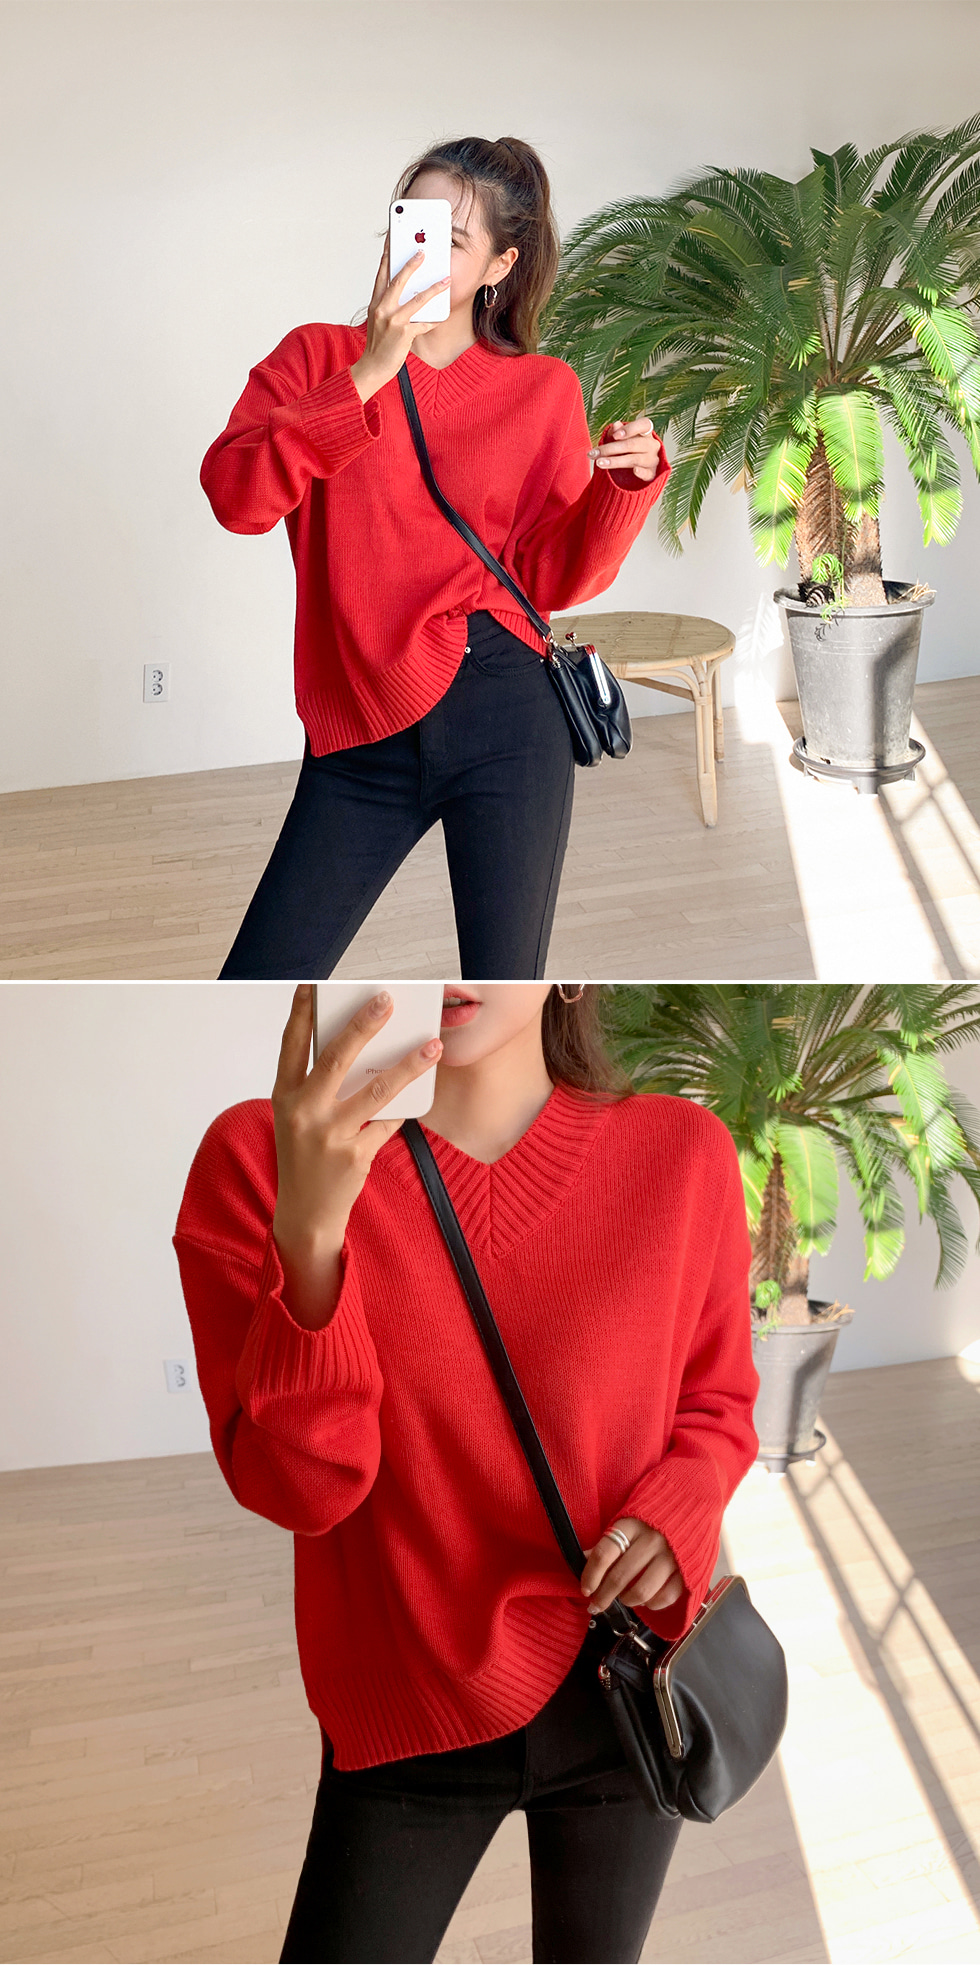 Unbald V-Neck Knitwear